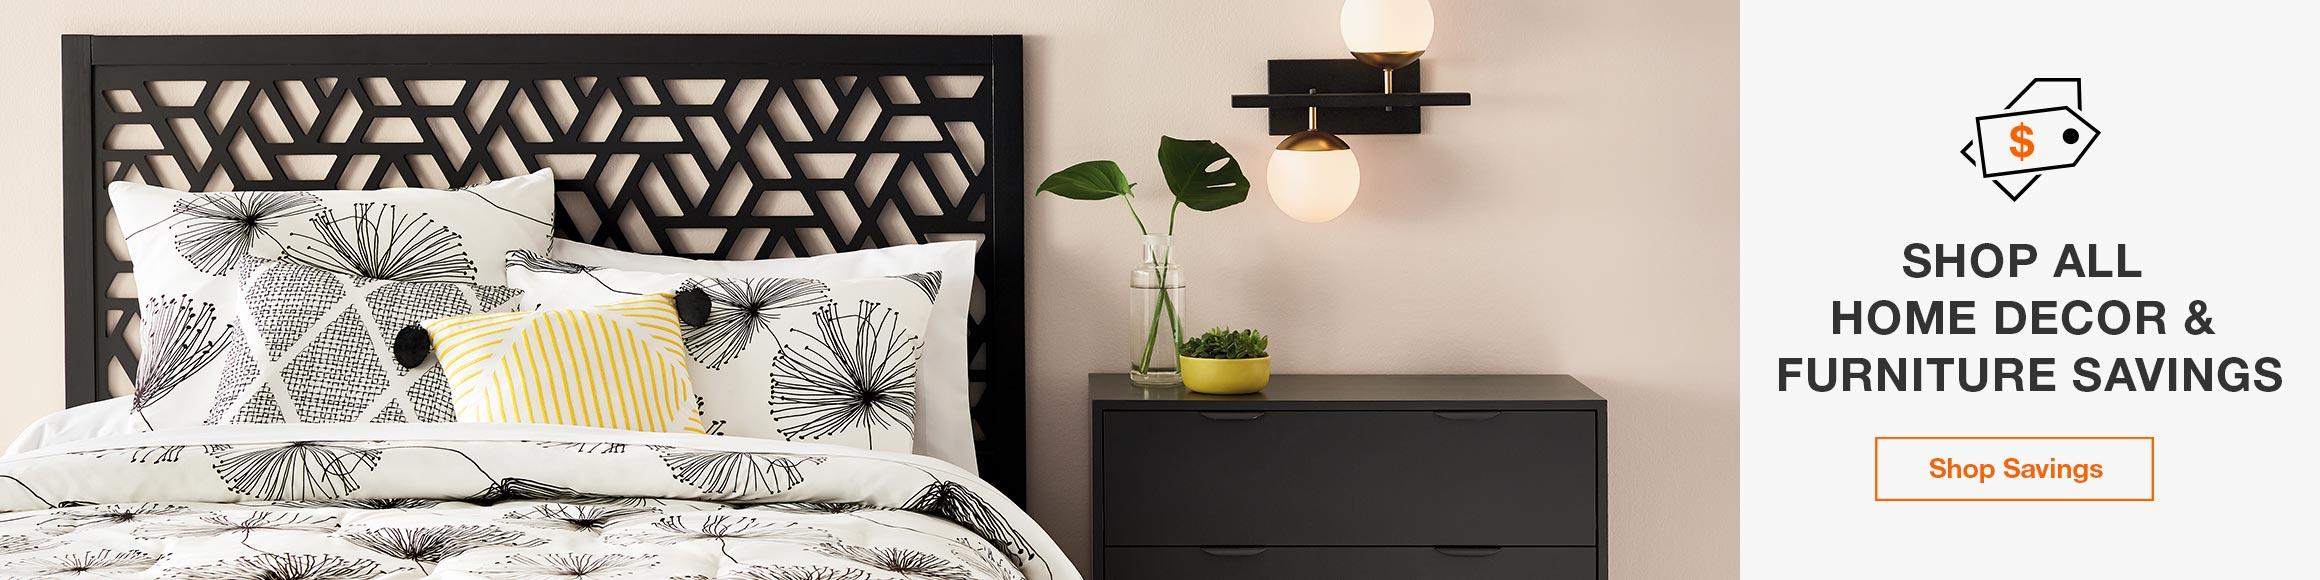 Shop All Home Decor & Furniture Savings